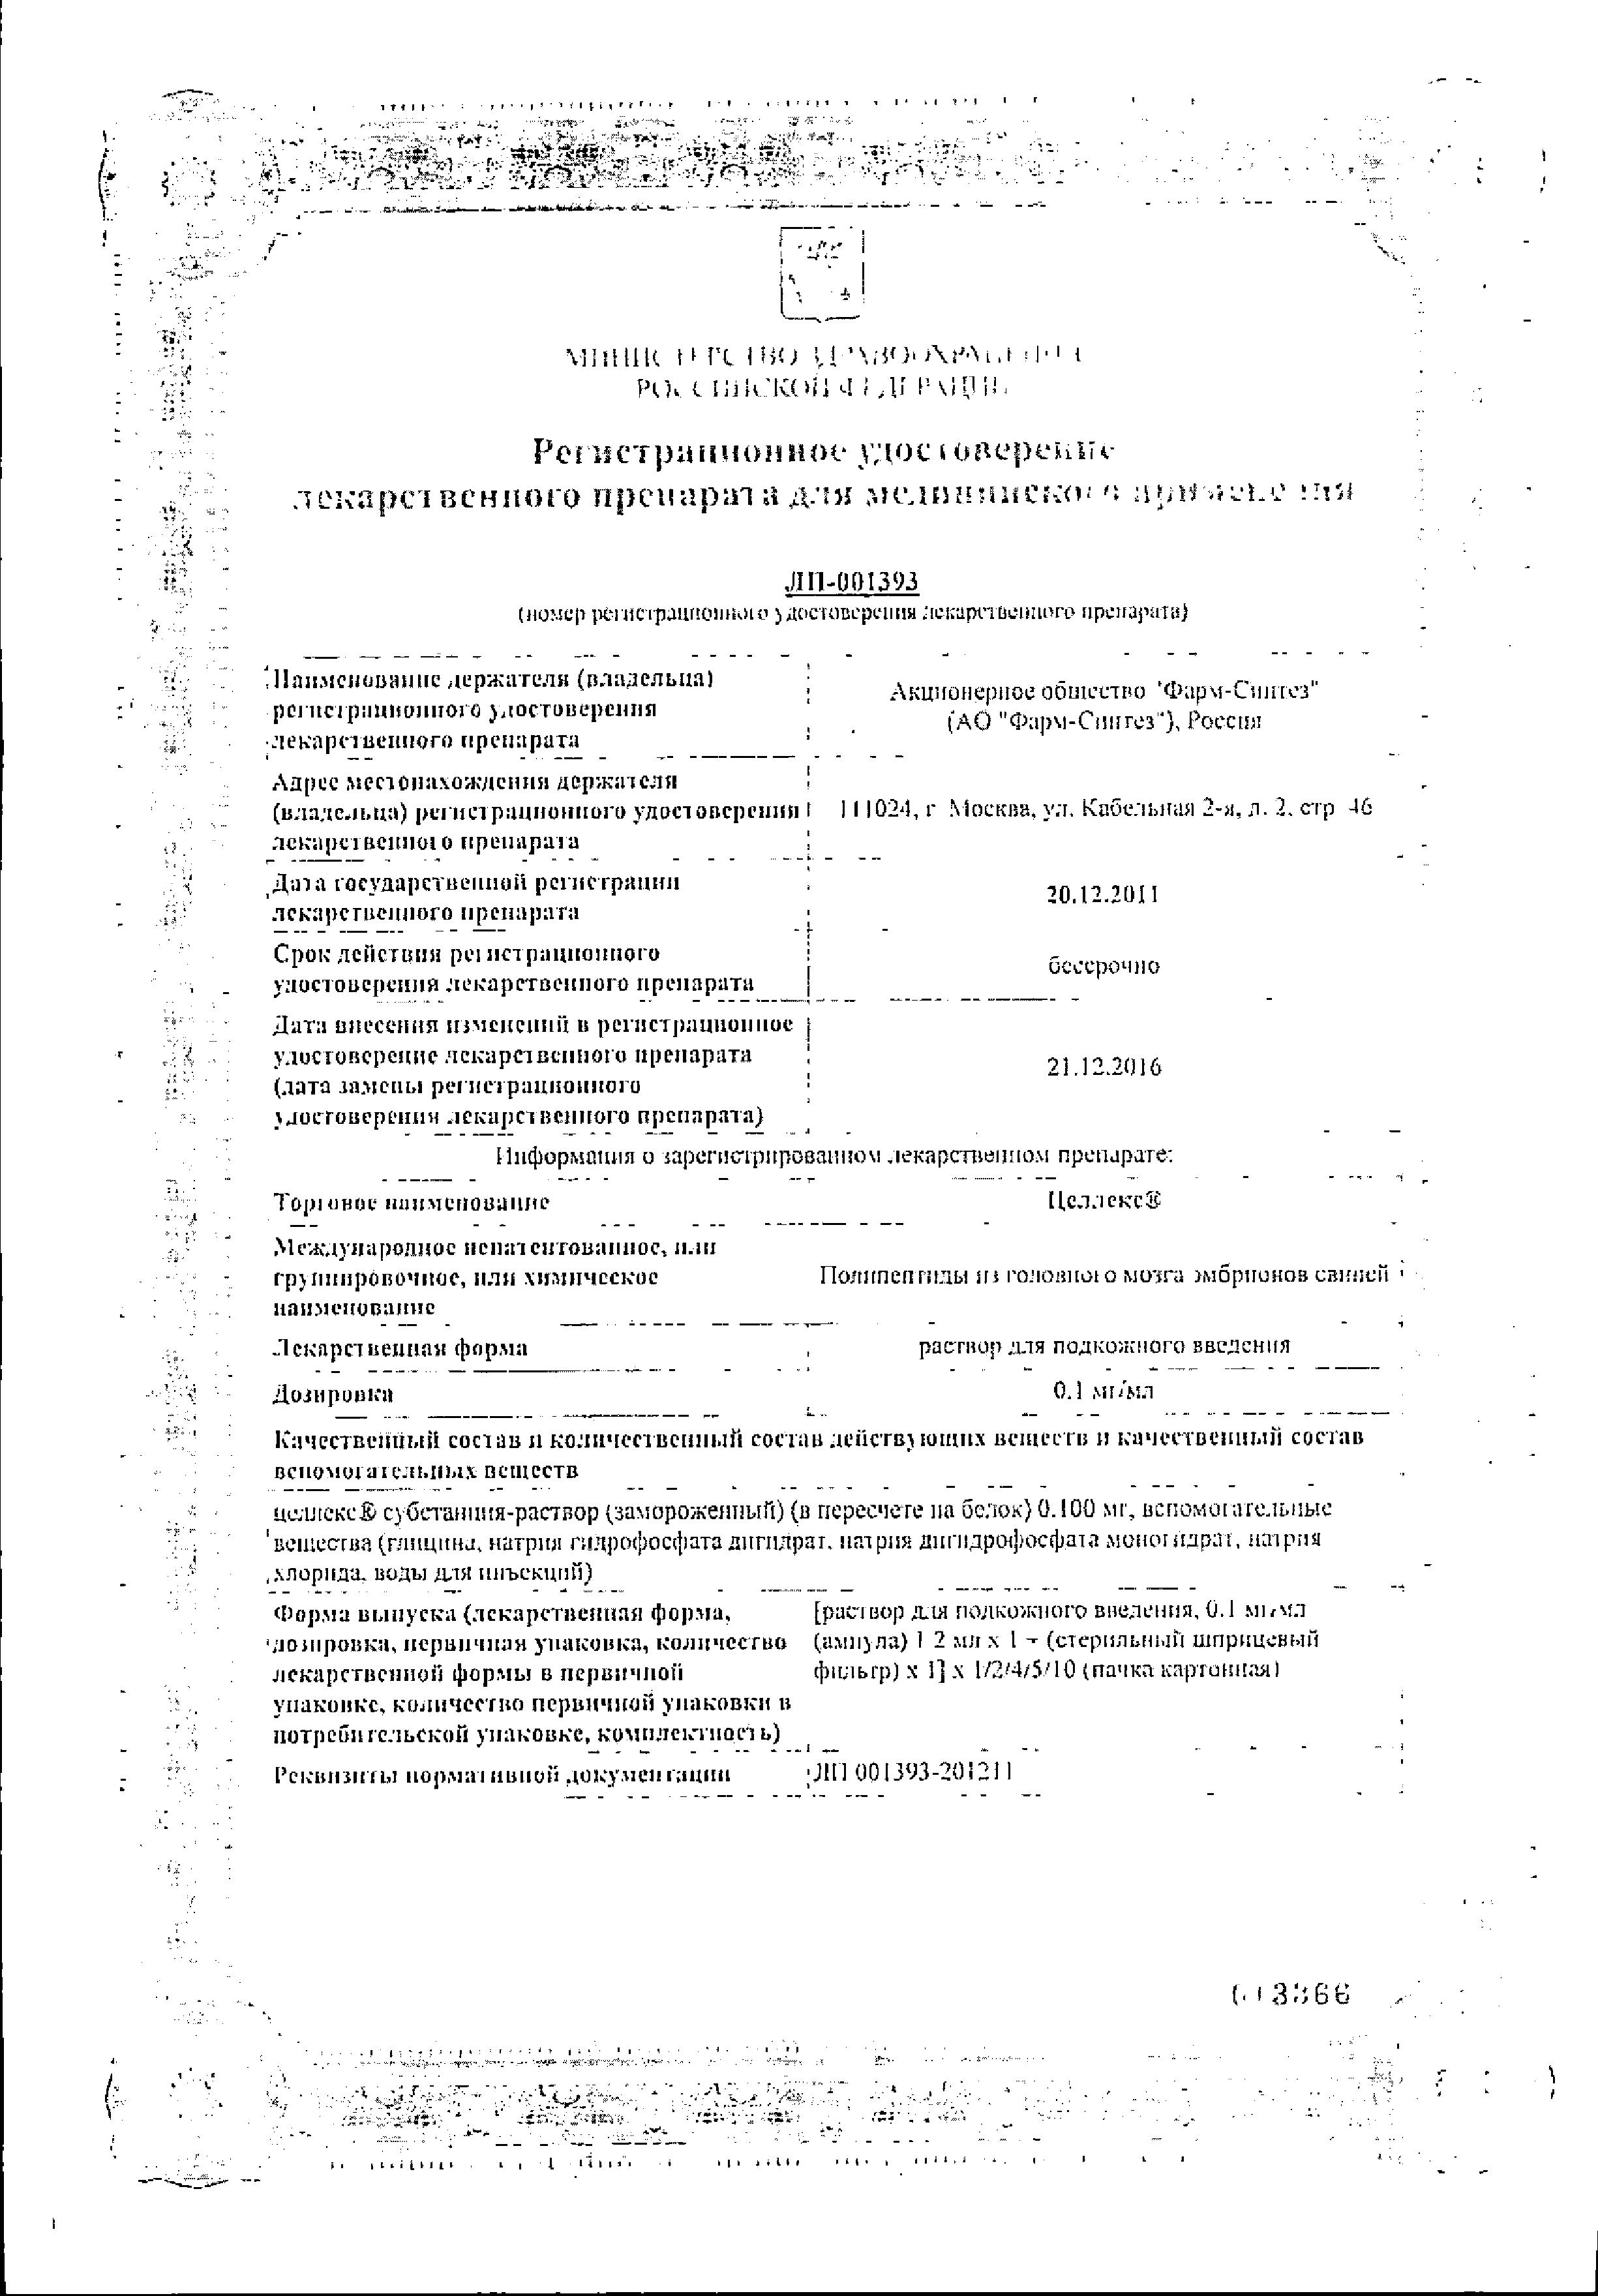 Целлекс сертификат